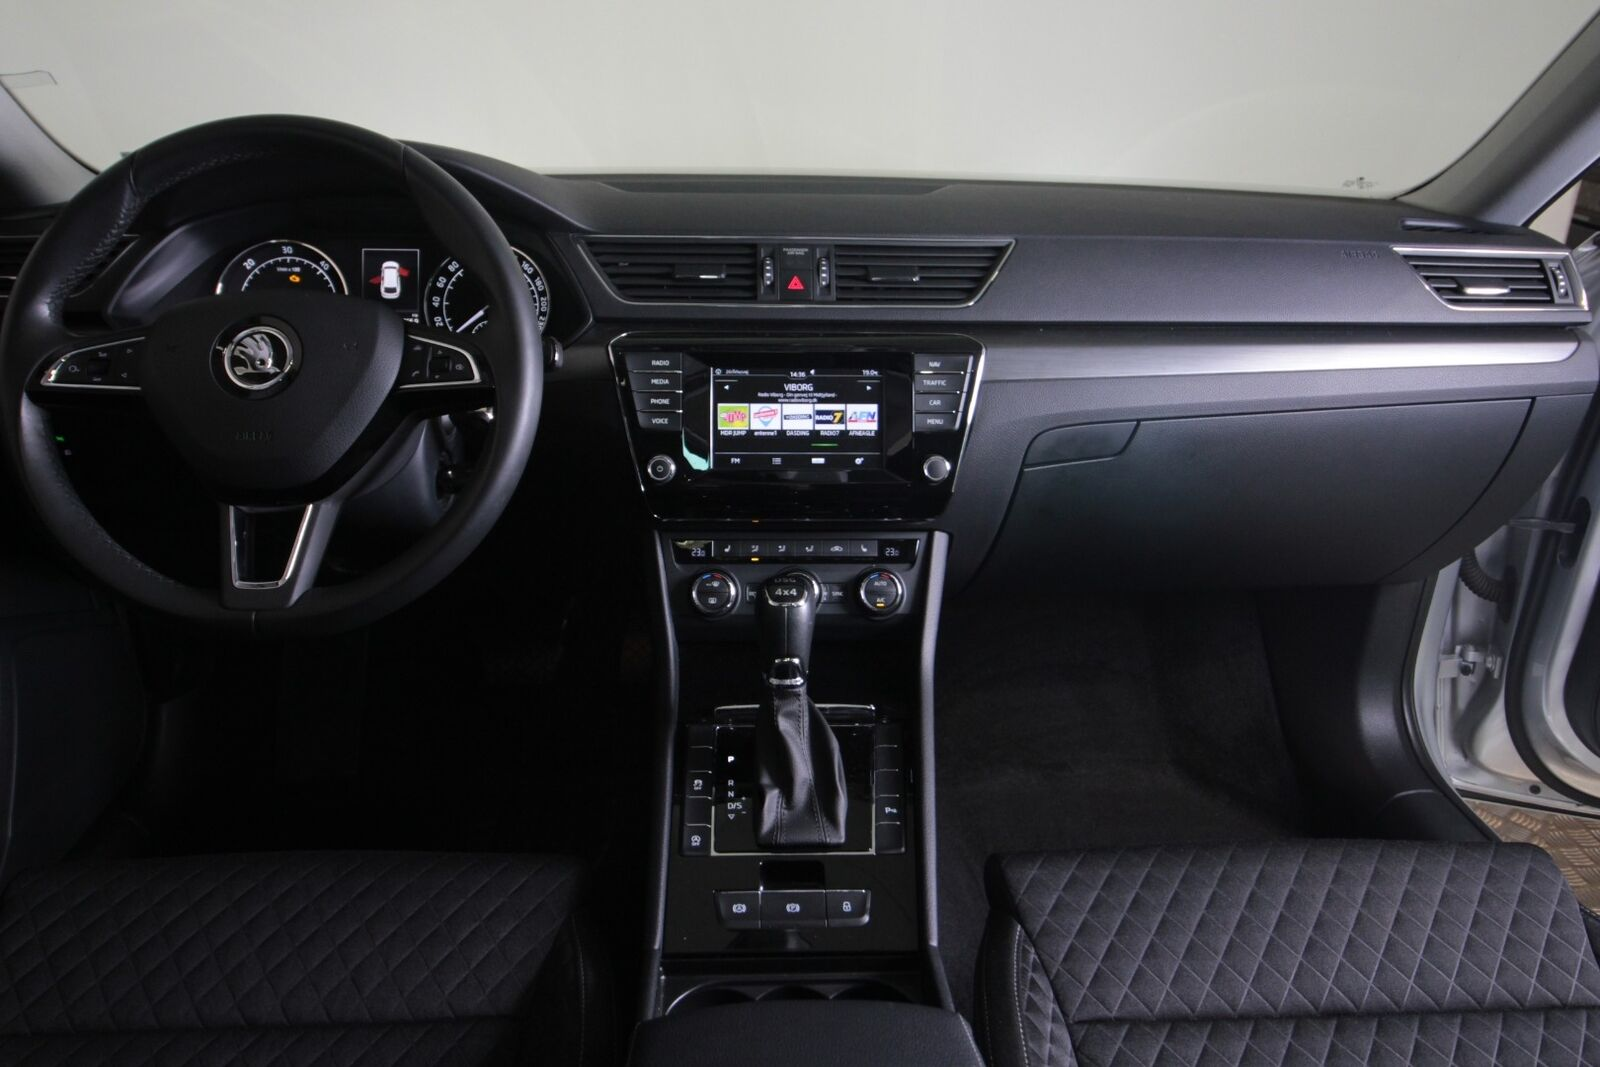 Skoda Superb TDi 190 Style Combi DSG 4x4